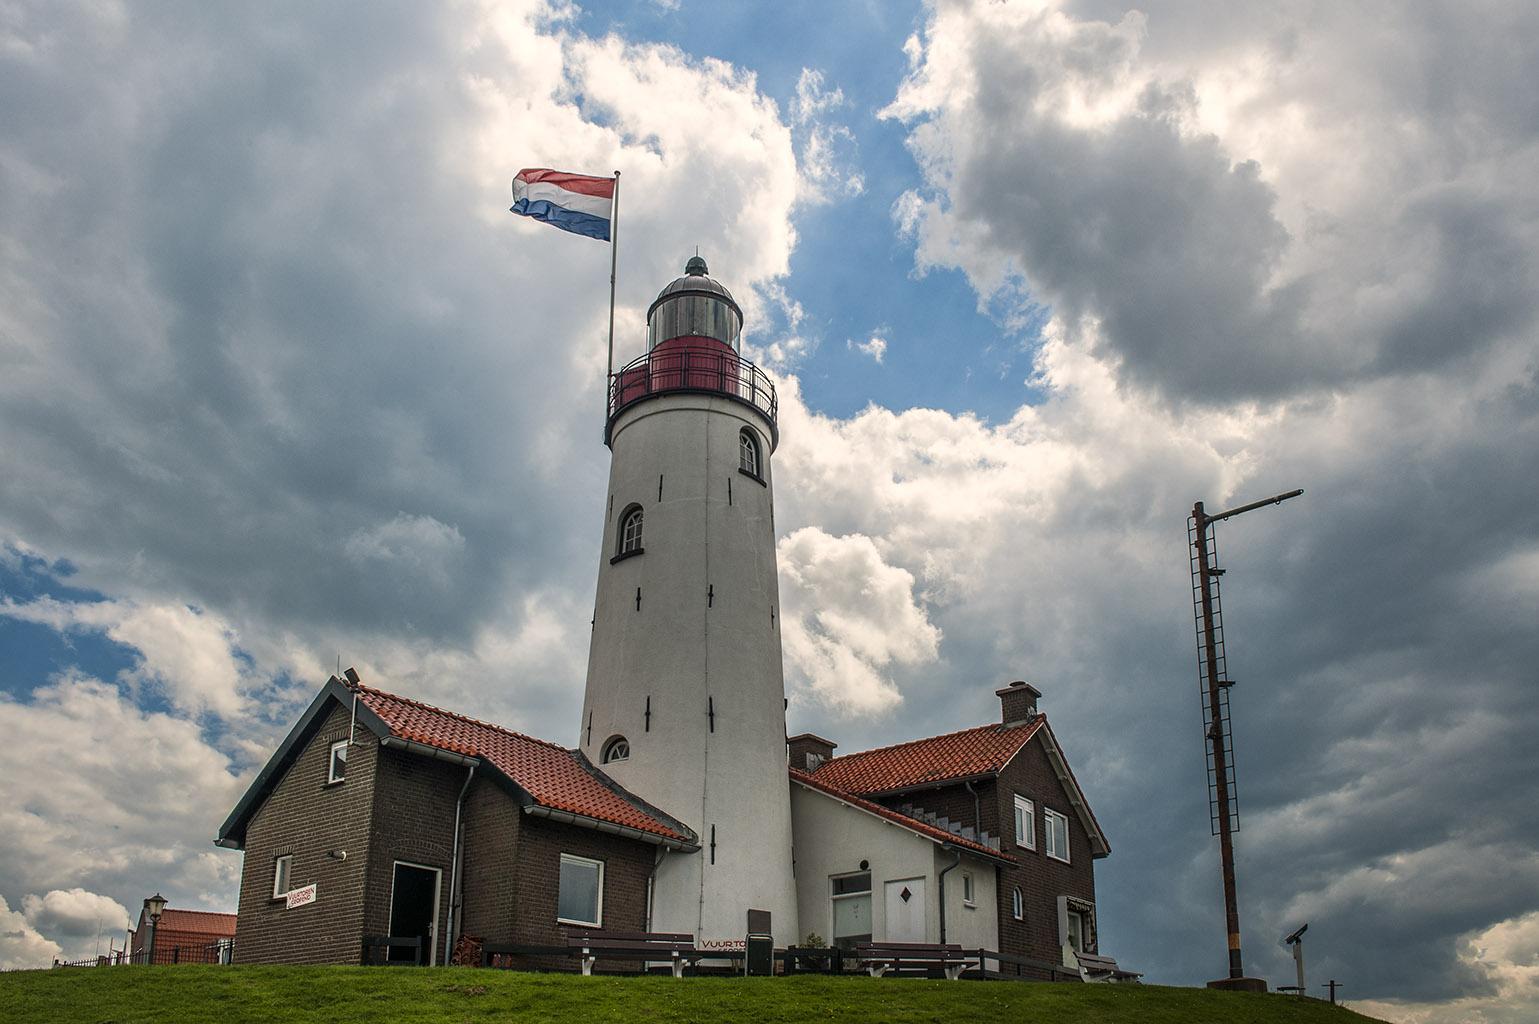 Urk, The Netherlands